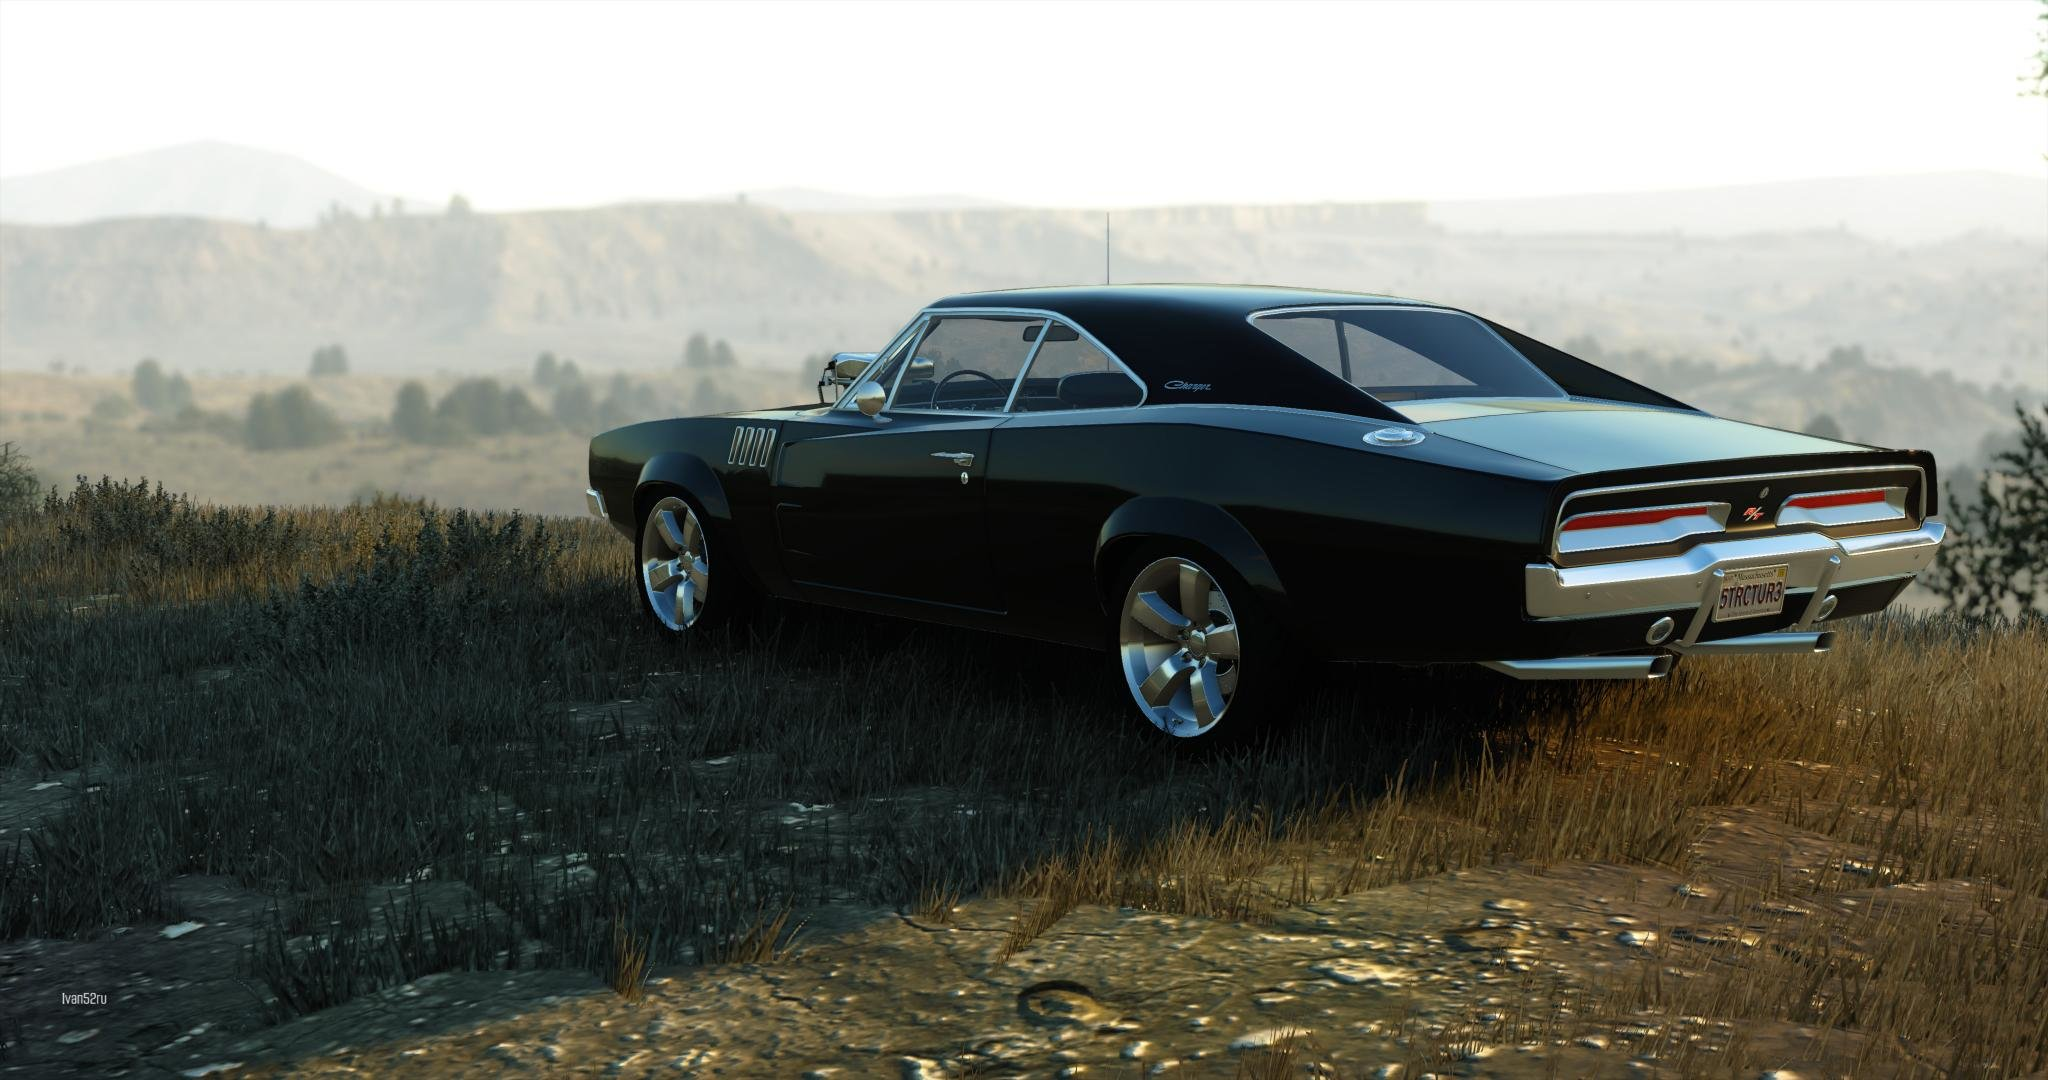 Free Download Grand Theft Auto V Wallpaper Id - Gta 5 Wallpaper Auto , HD Wallpaper & Backgrounds